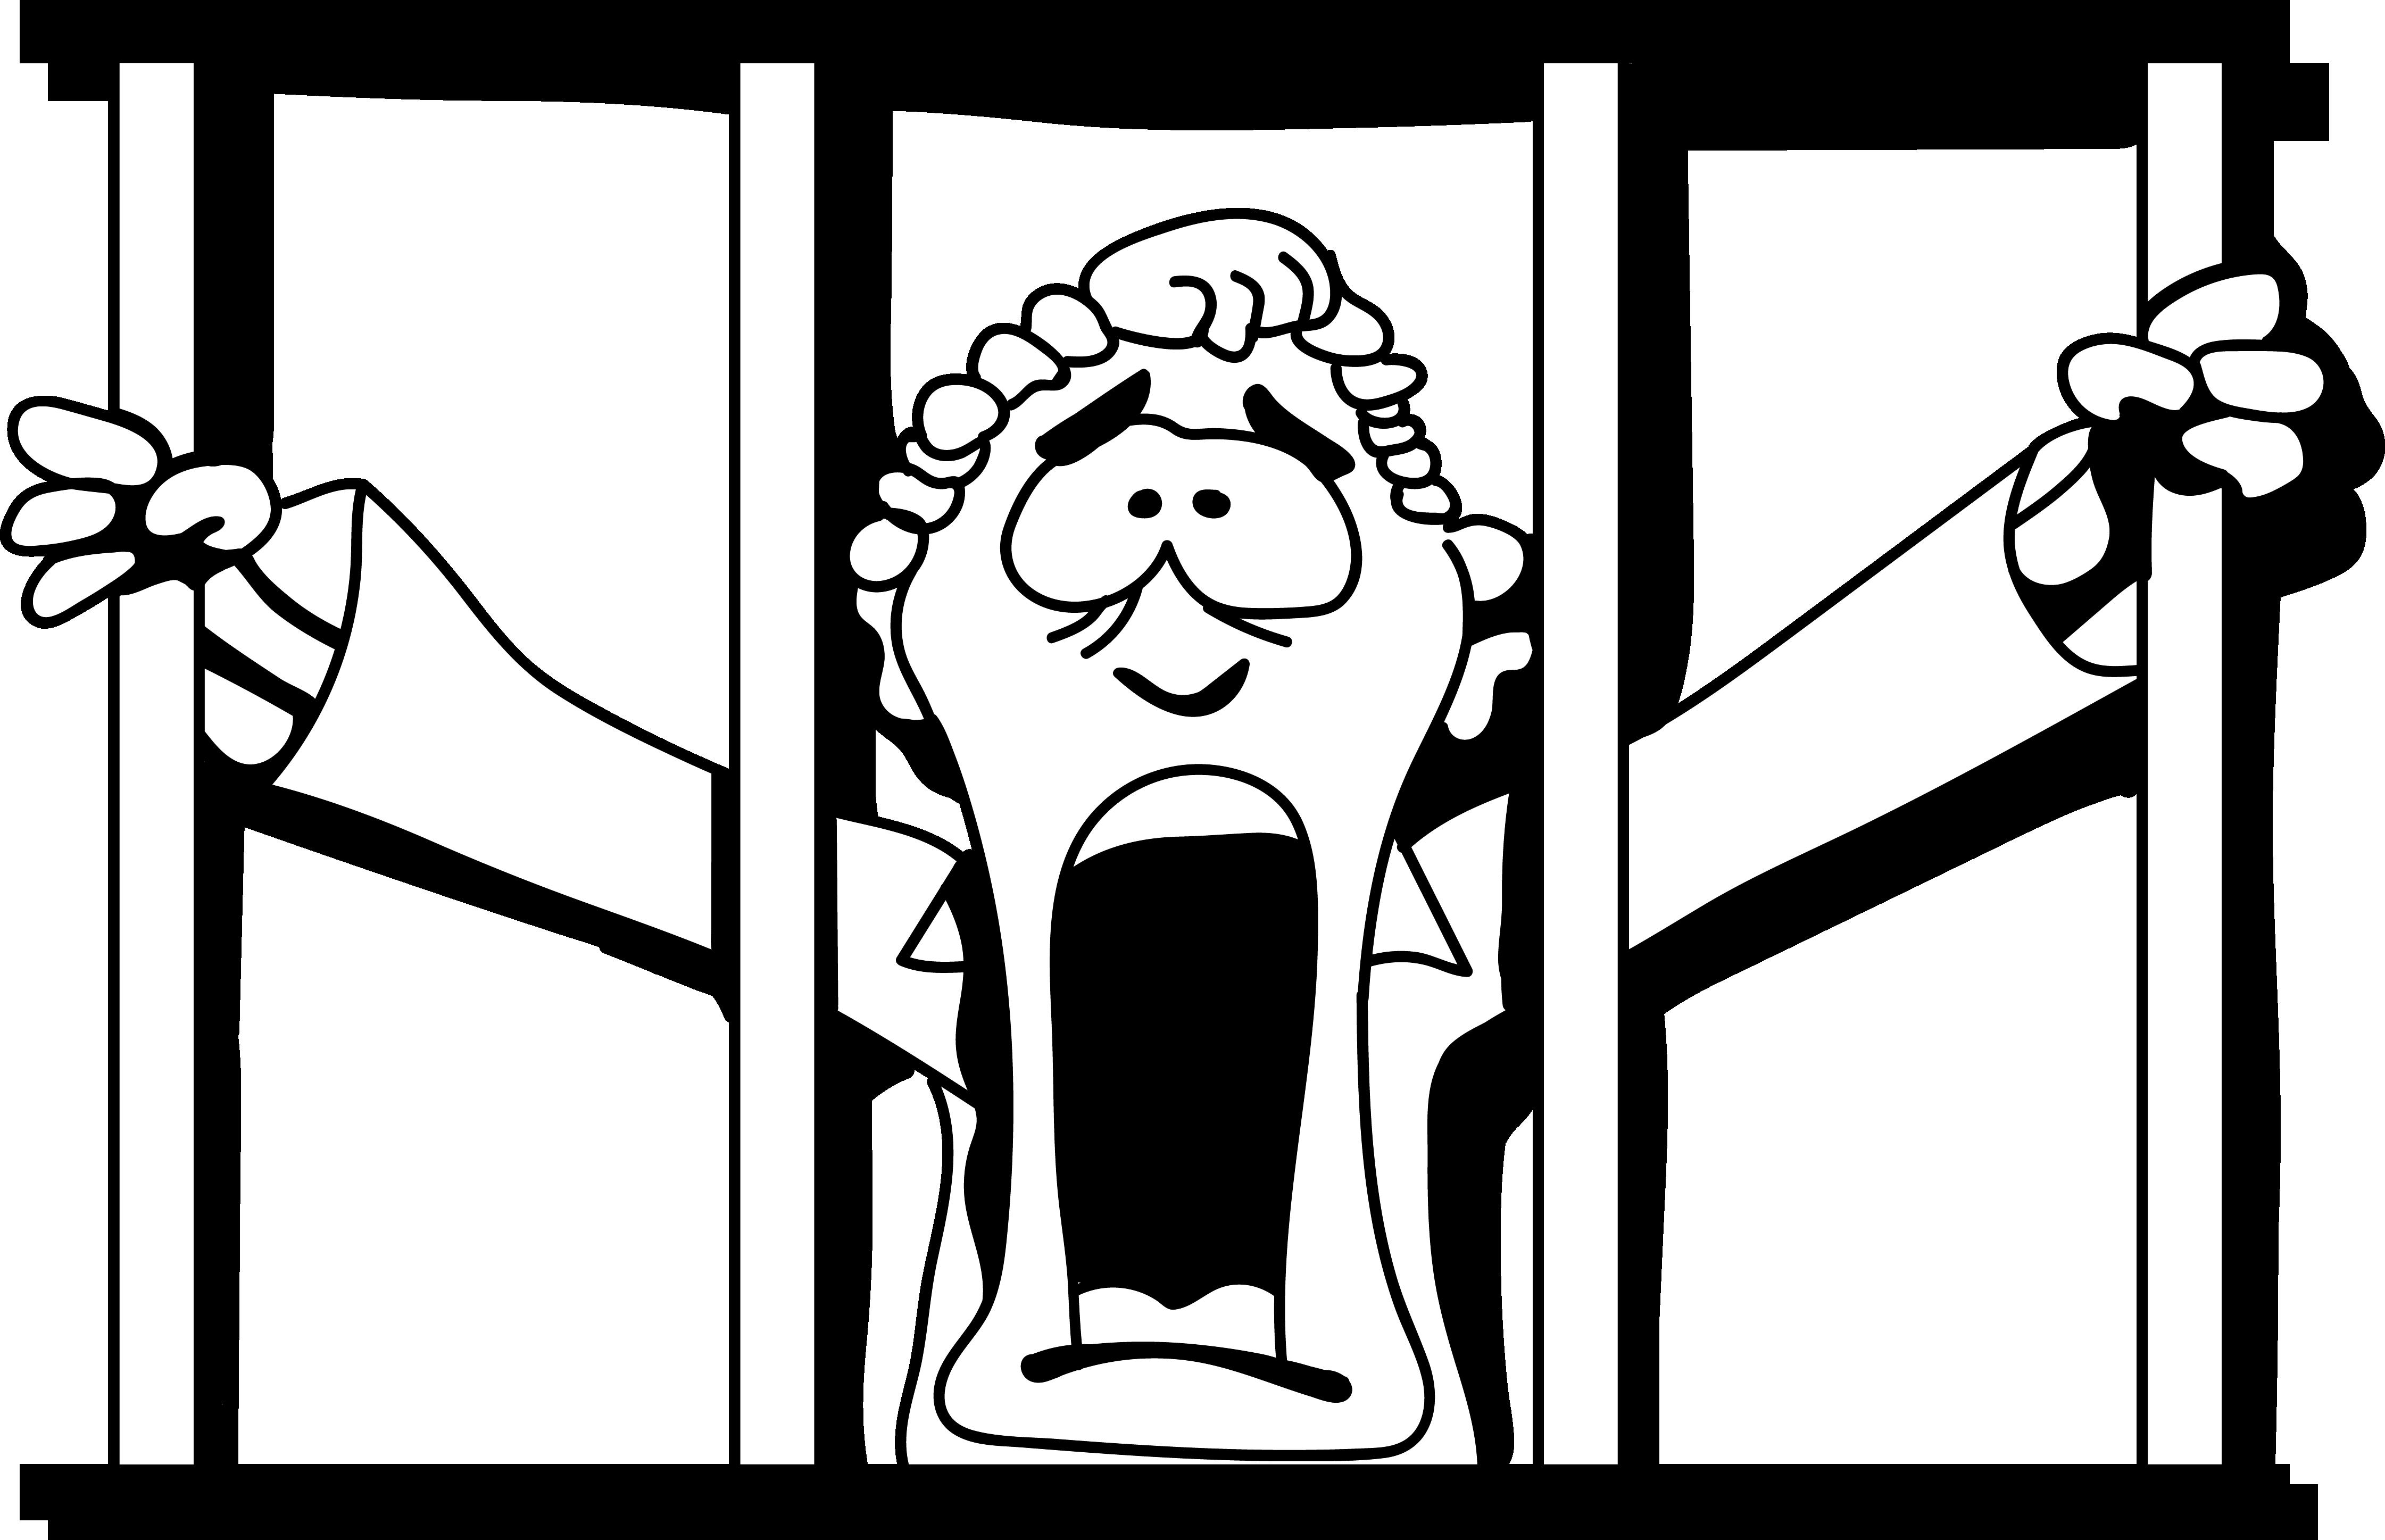 Agents denver colorado all. Criminal clipart bail